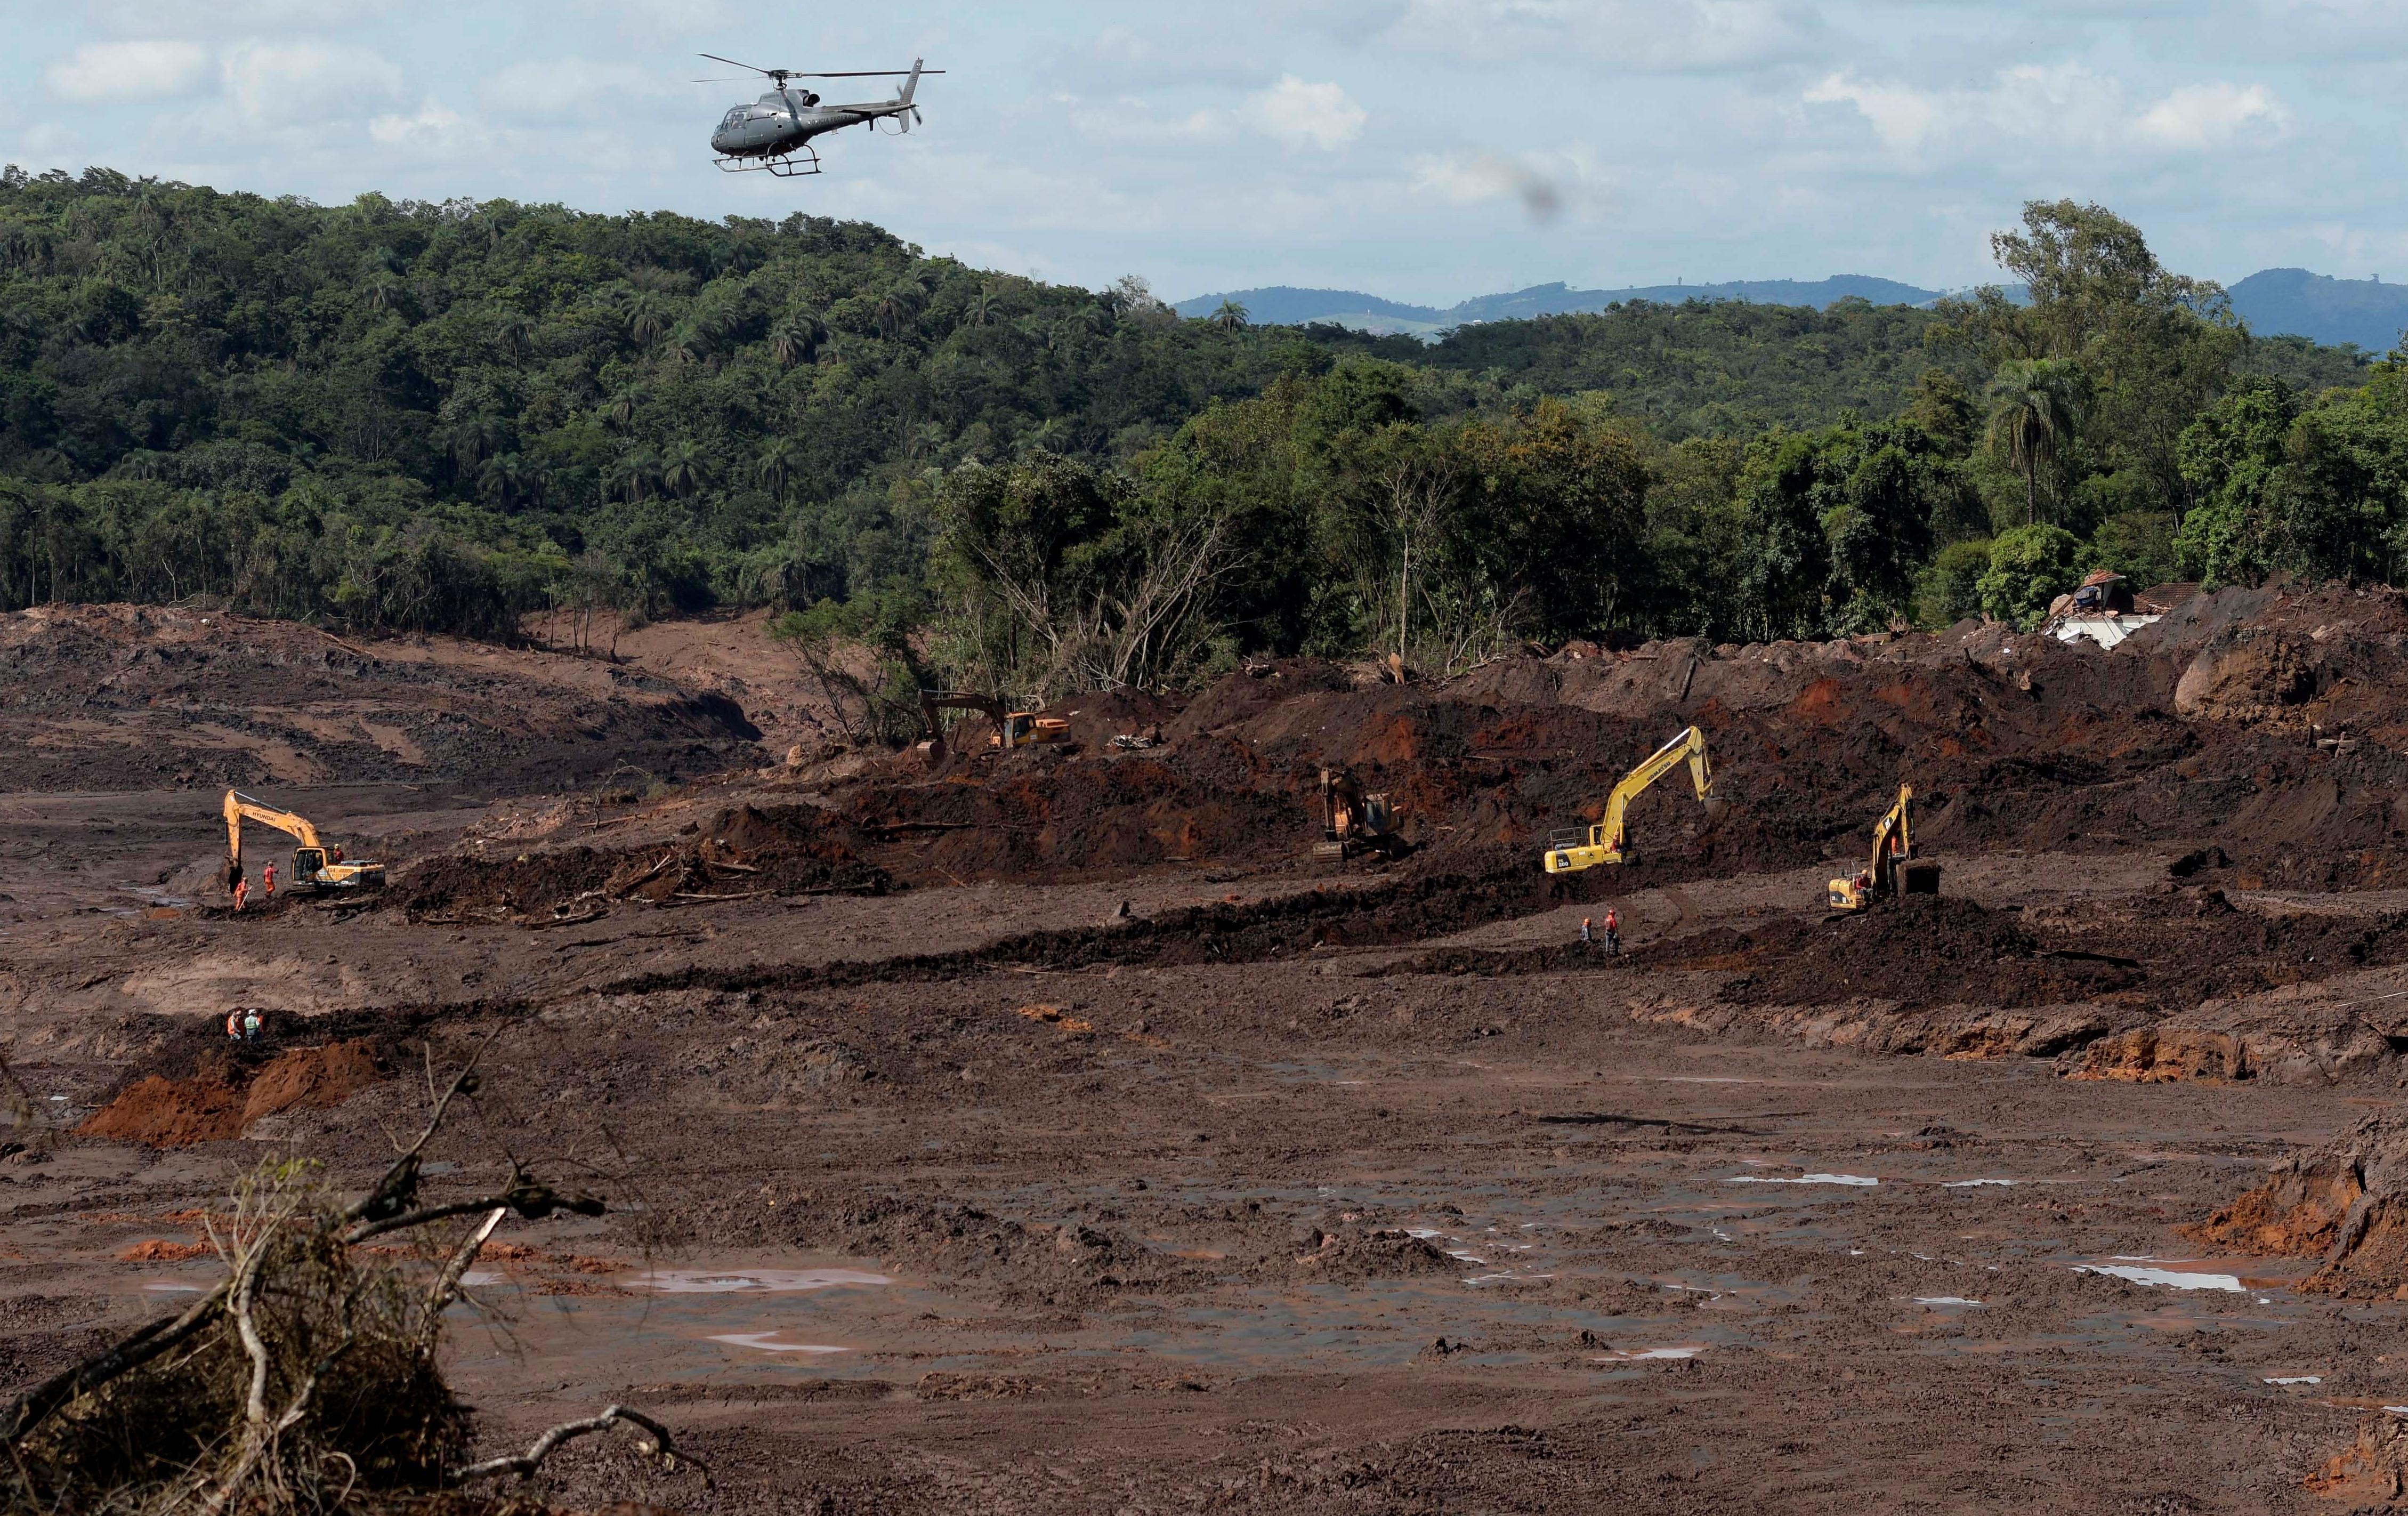 One year after Vale dam break, pain runs deep in Brazil mine...